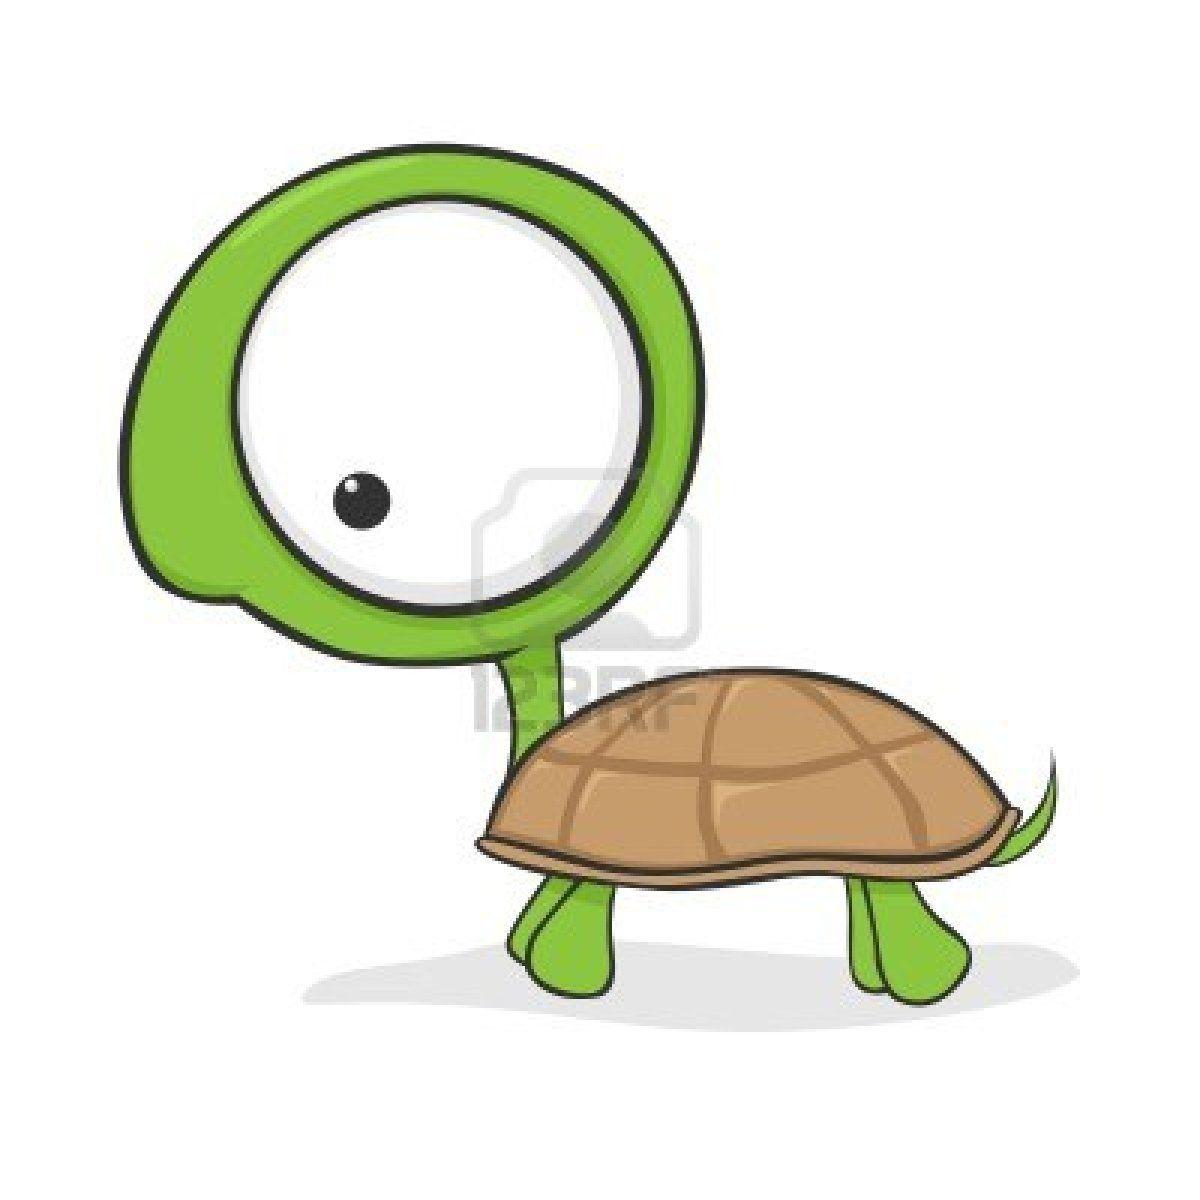 1200x1200 Cute Cartoon Characters Big Eyes Cute Cartoon Turtle